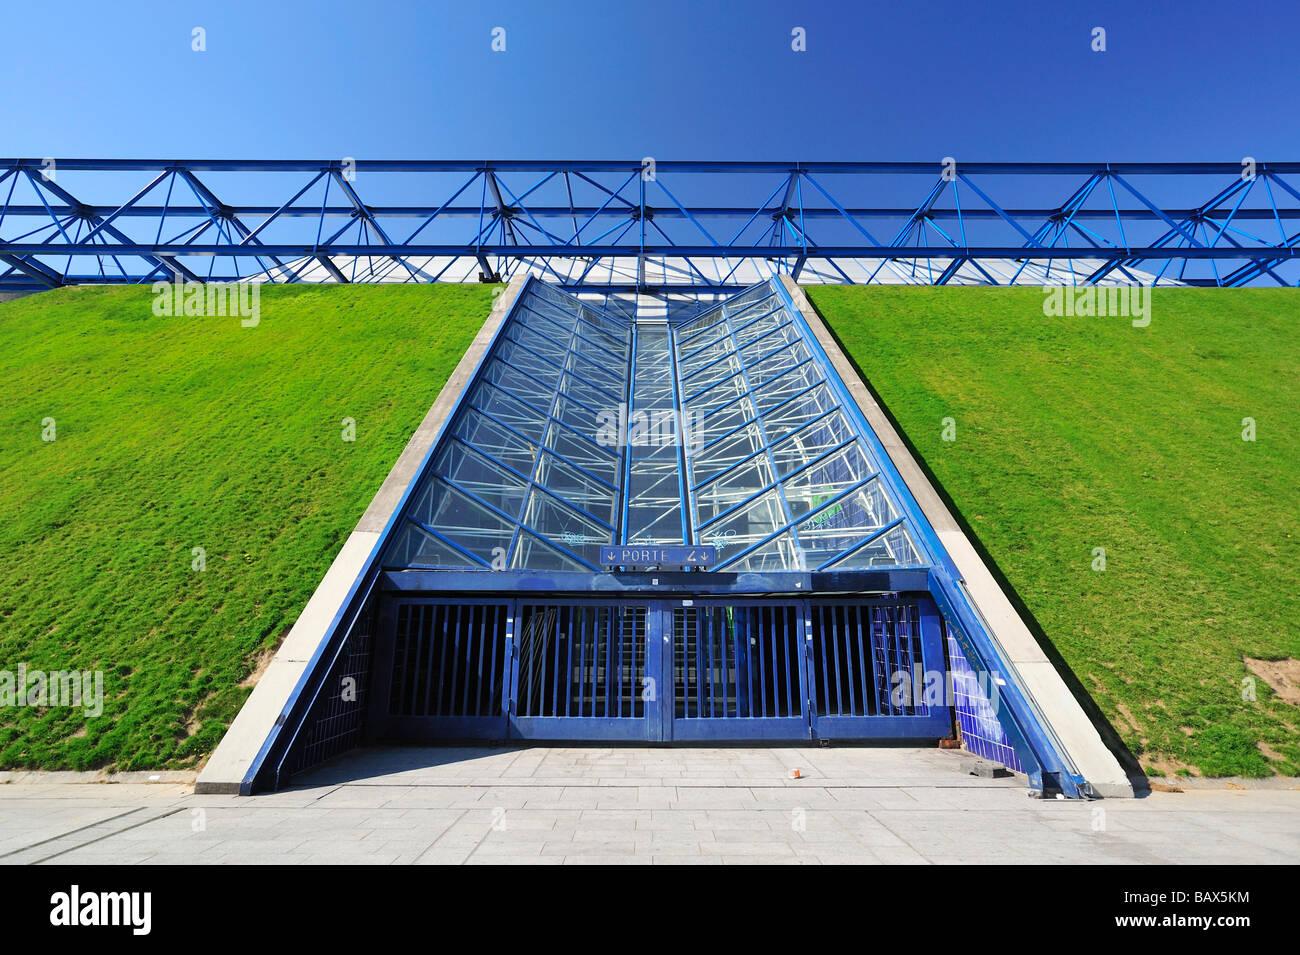 Palais Omnisports Paris Bercy, Paris, France - Stock Image